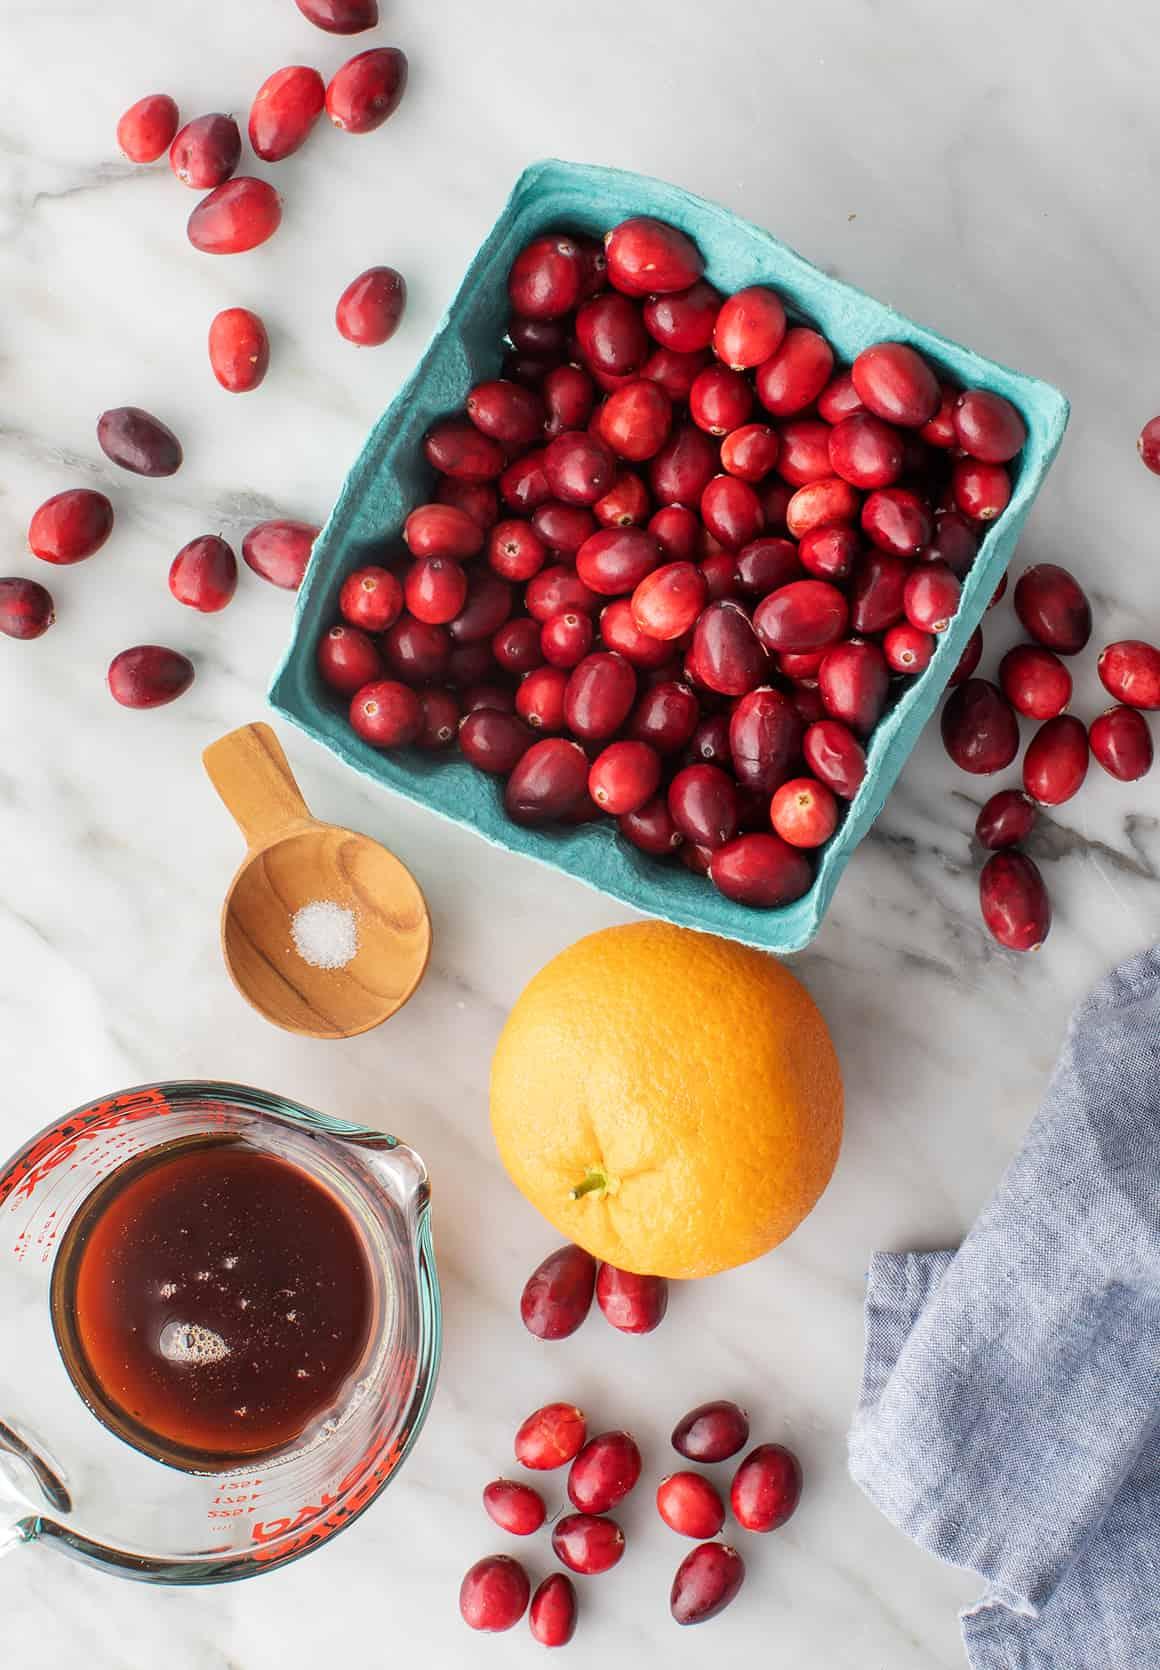 Cranberry sauce recipe ingredients